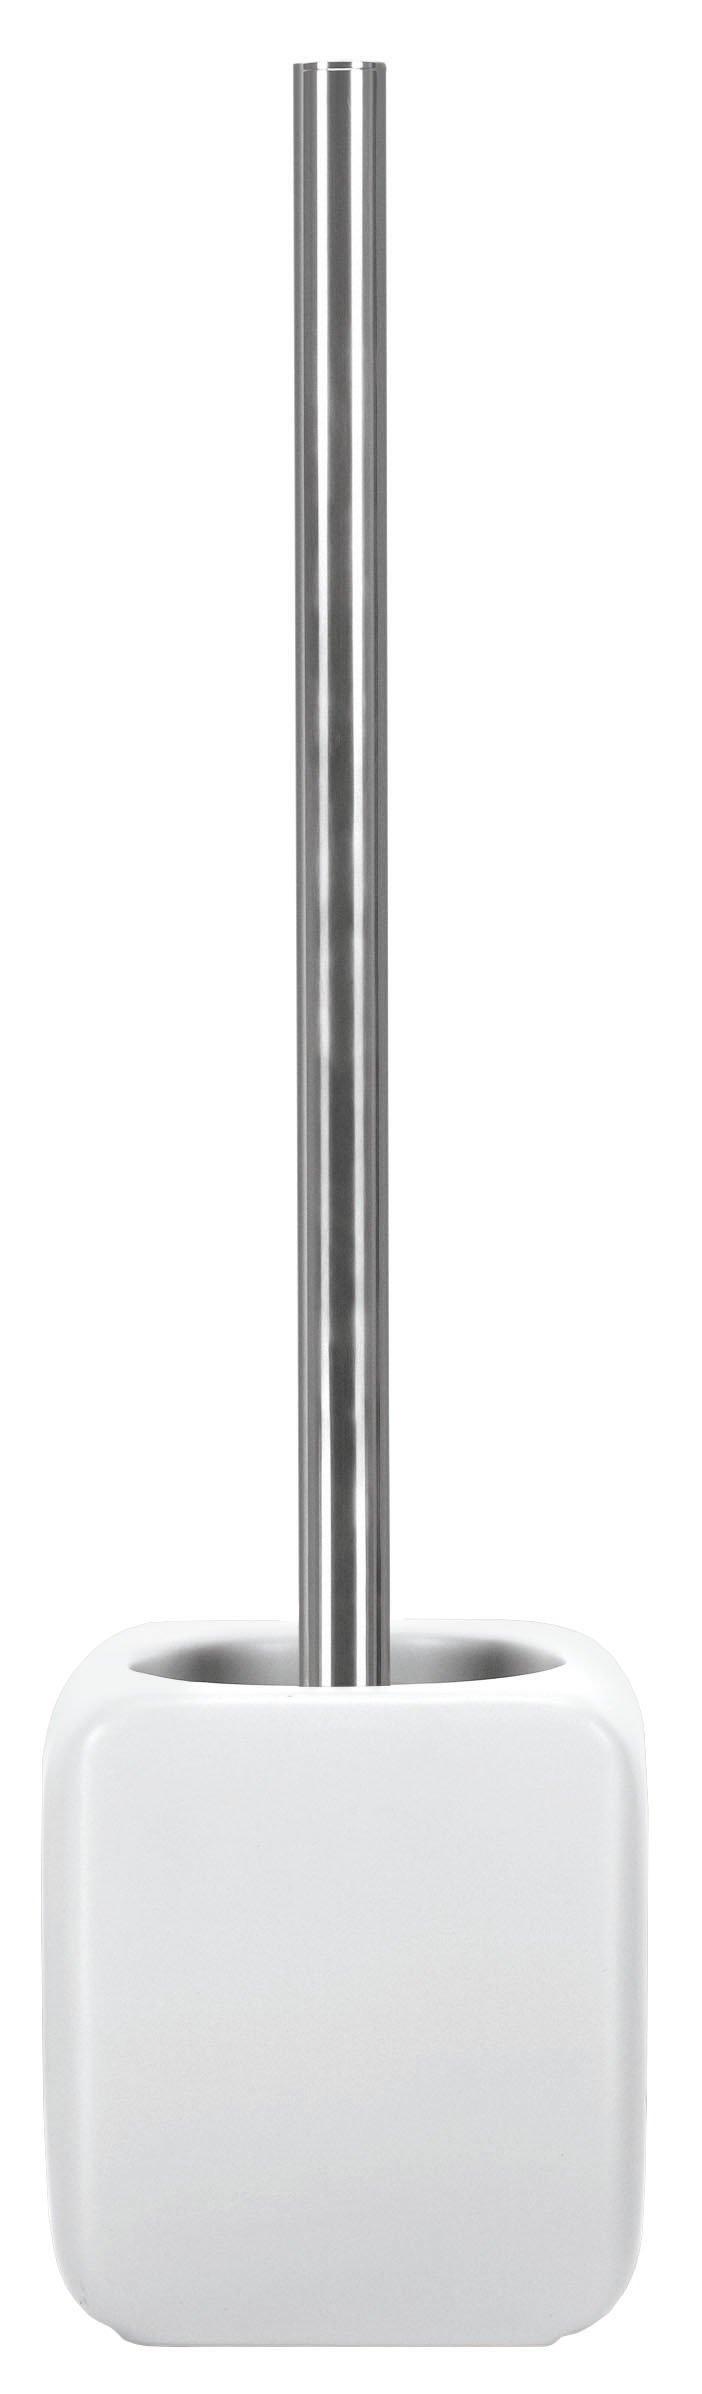 WC-Bürstenhalter Cubic Weiss B:10,8cm